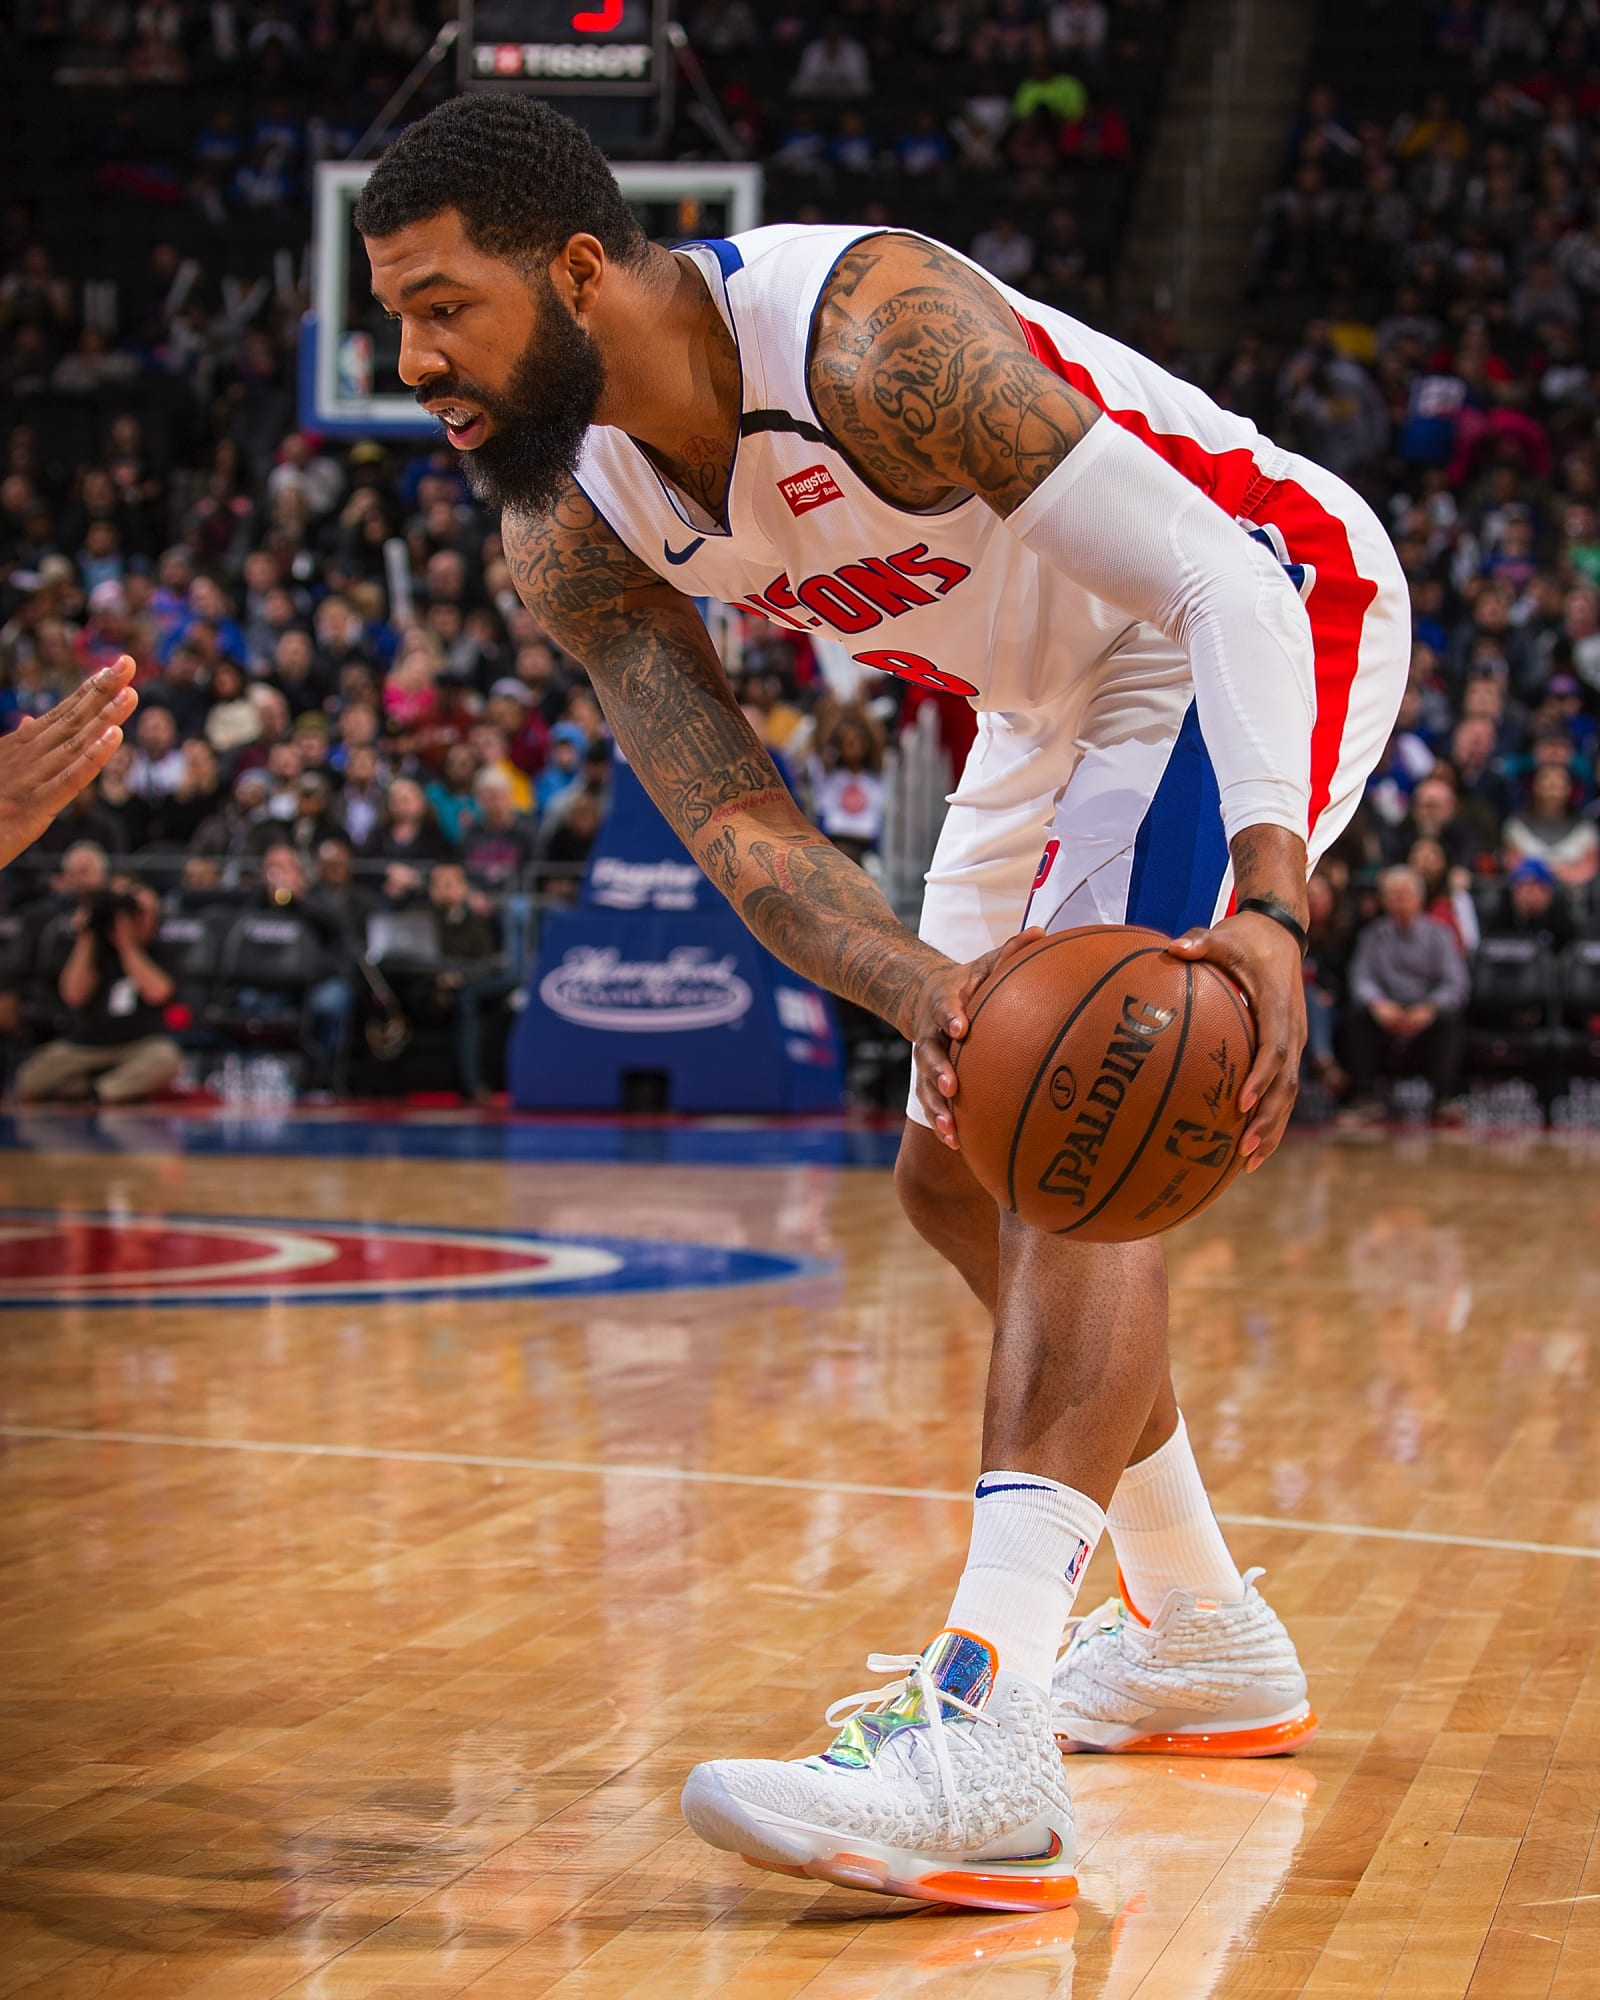 La Clippers Rumors Team Has Expressed Interest In Markieff Morris